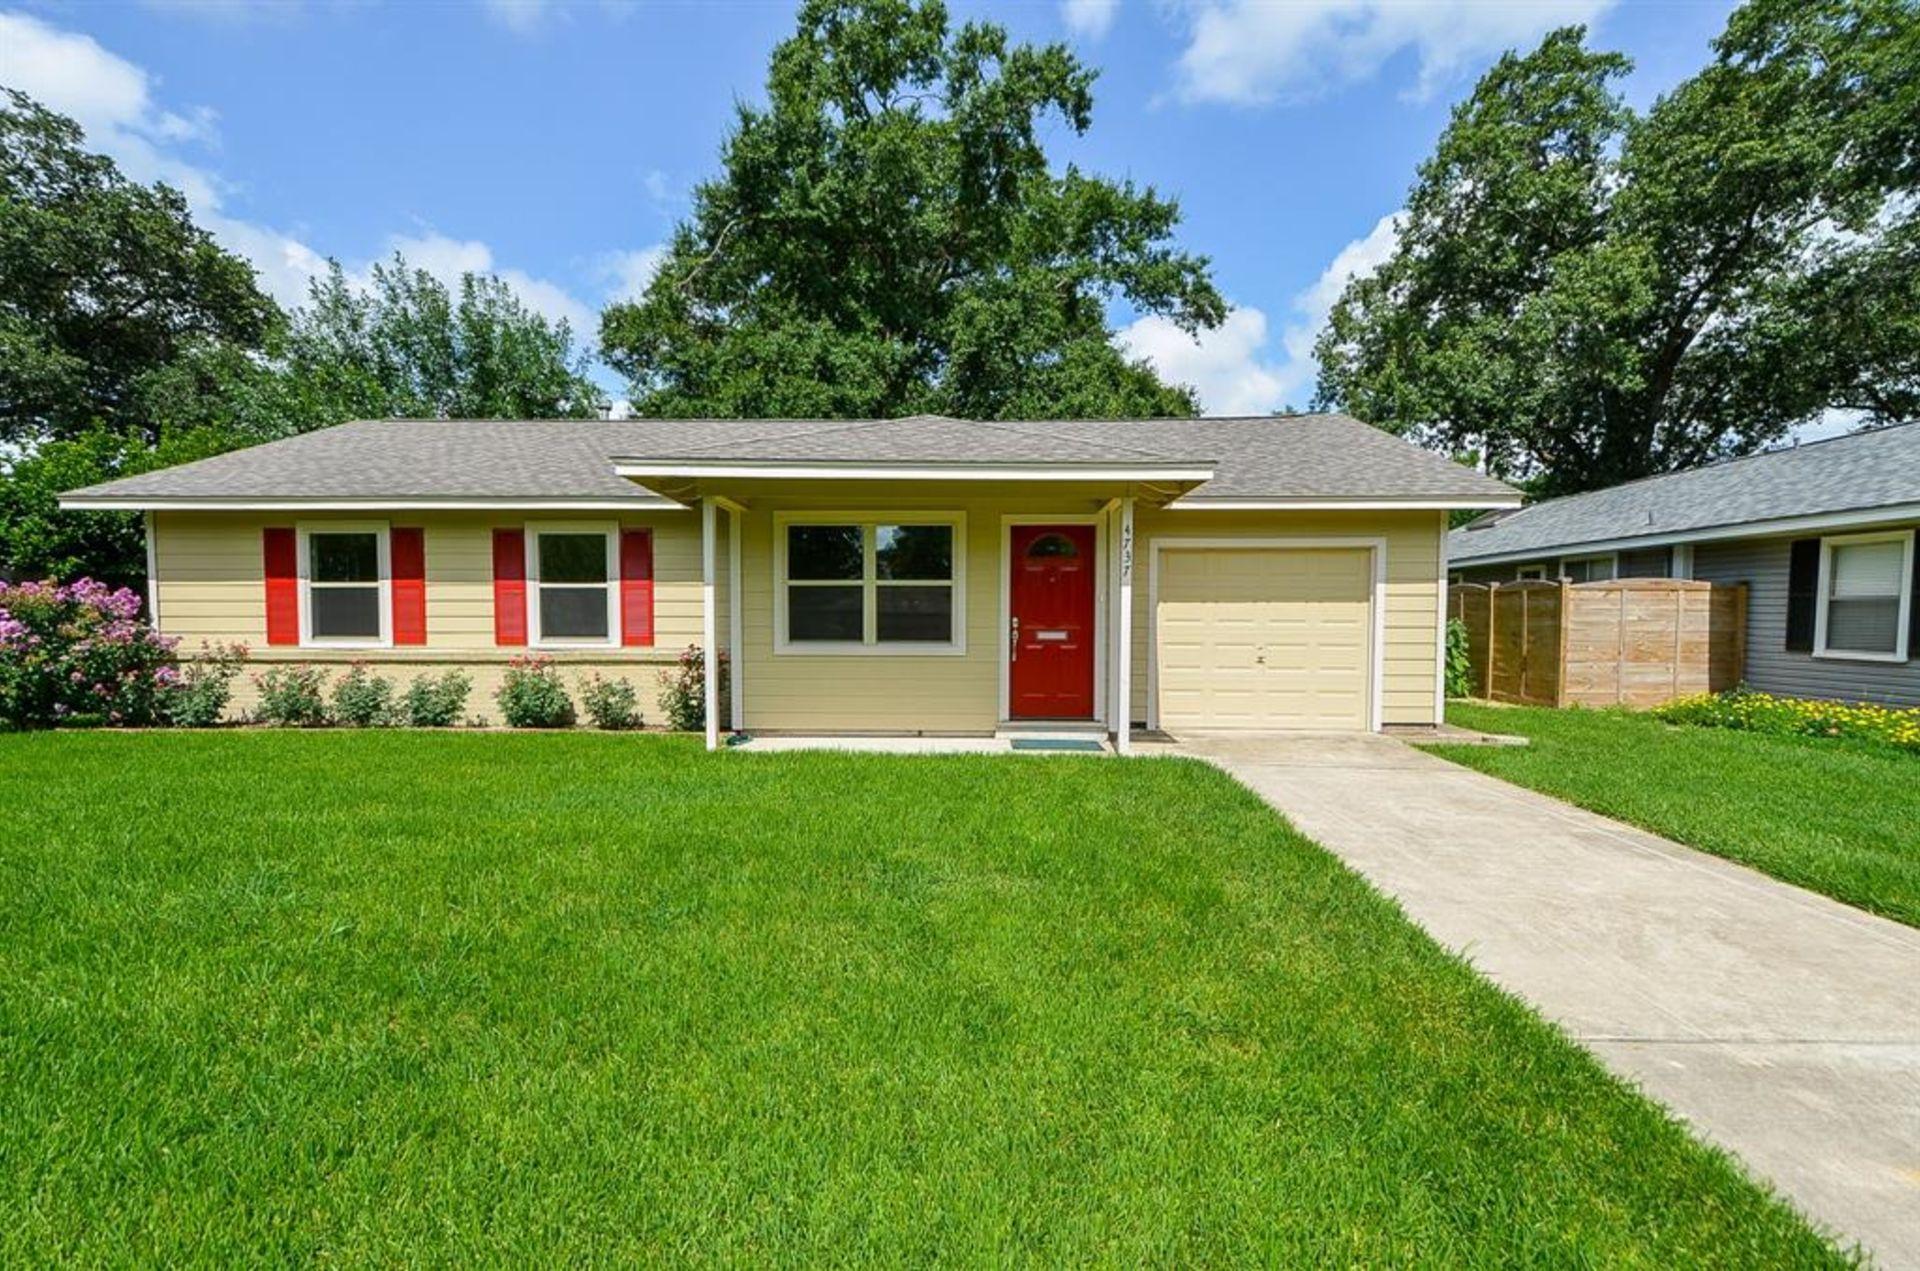 Houses For Sale In Harris: 4737 Carleen Road 77092